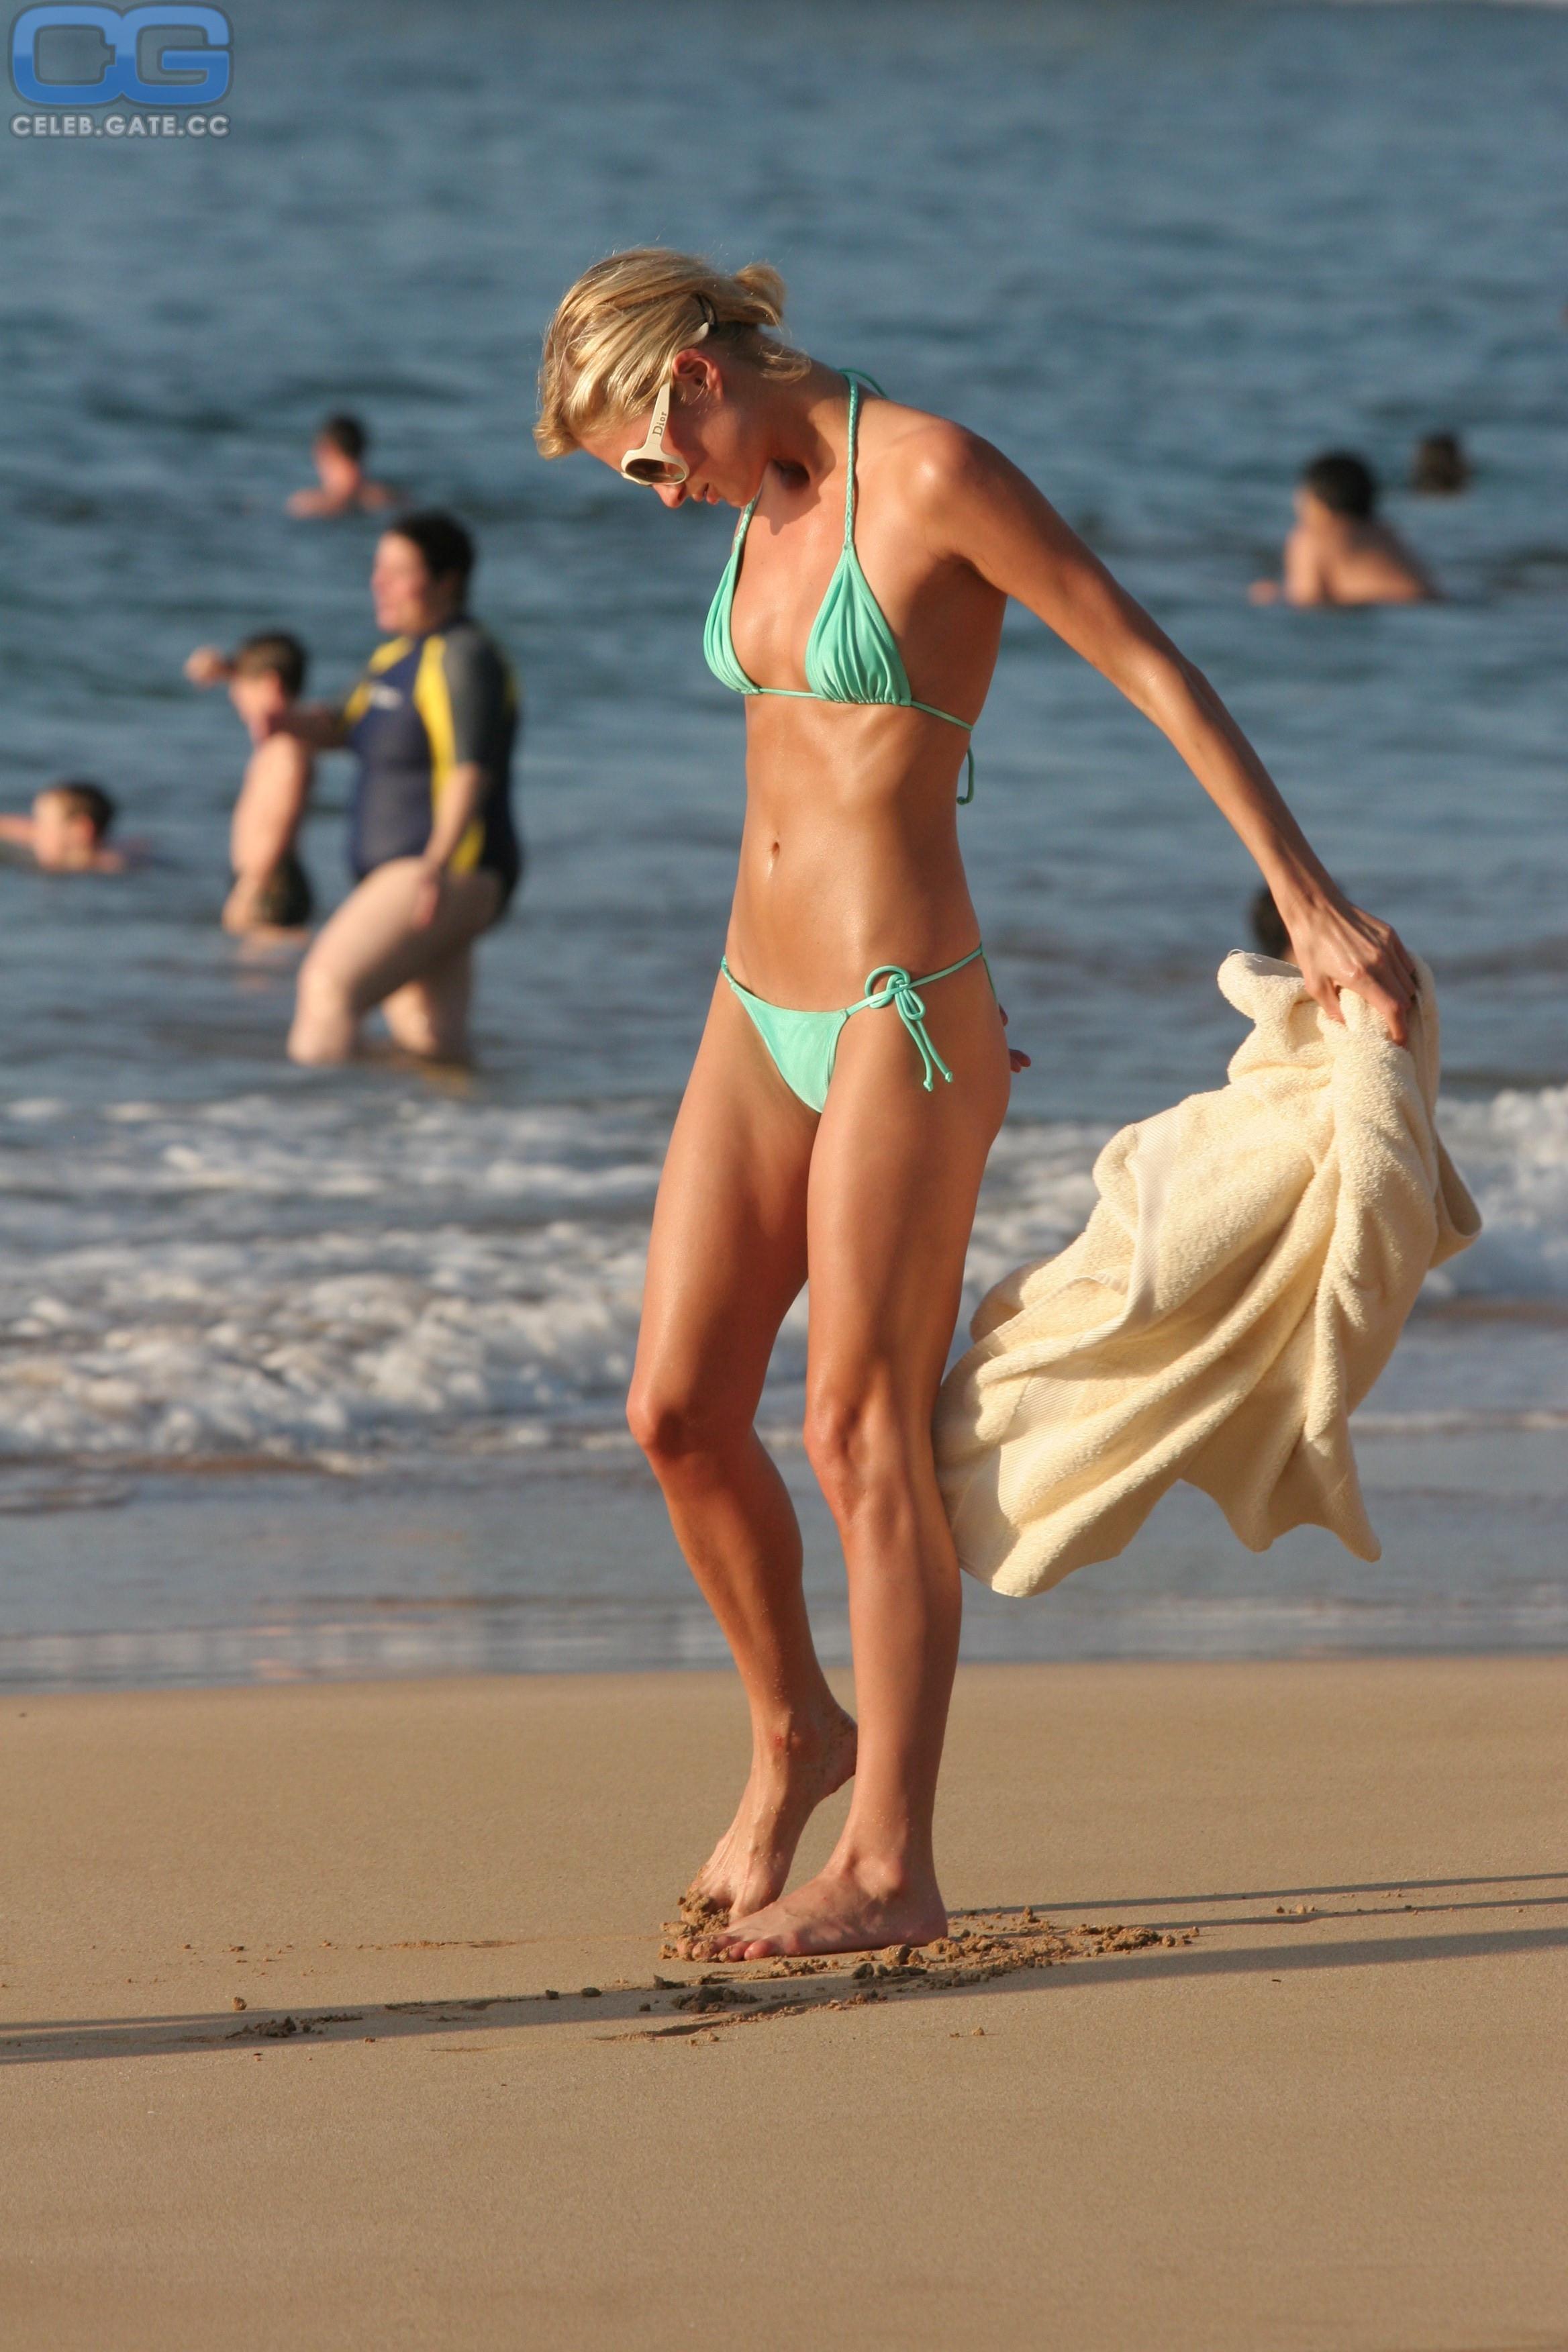 Paris Hilton Nude, Pictures, Photos, Playboy, Naked -5395